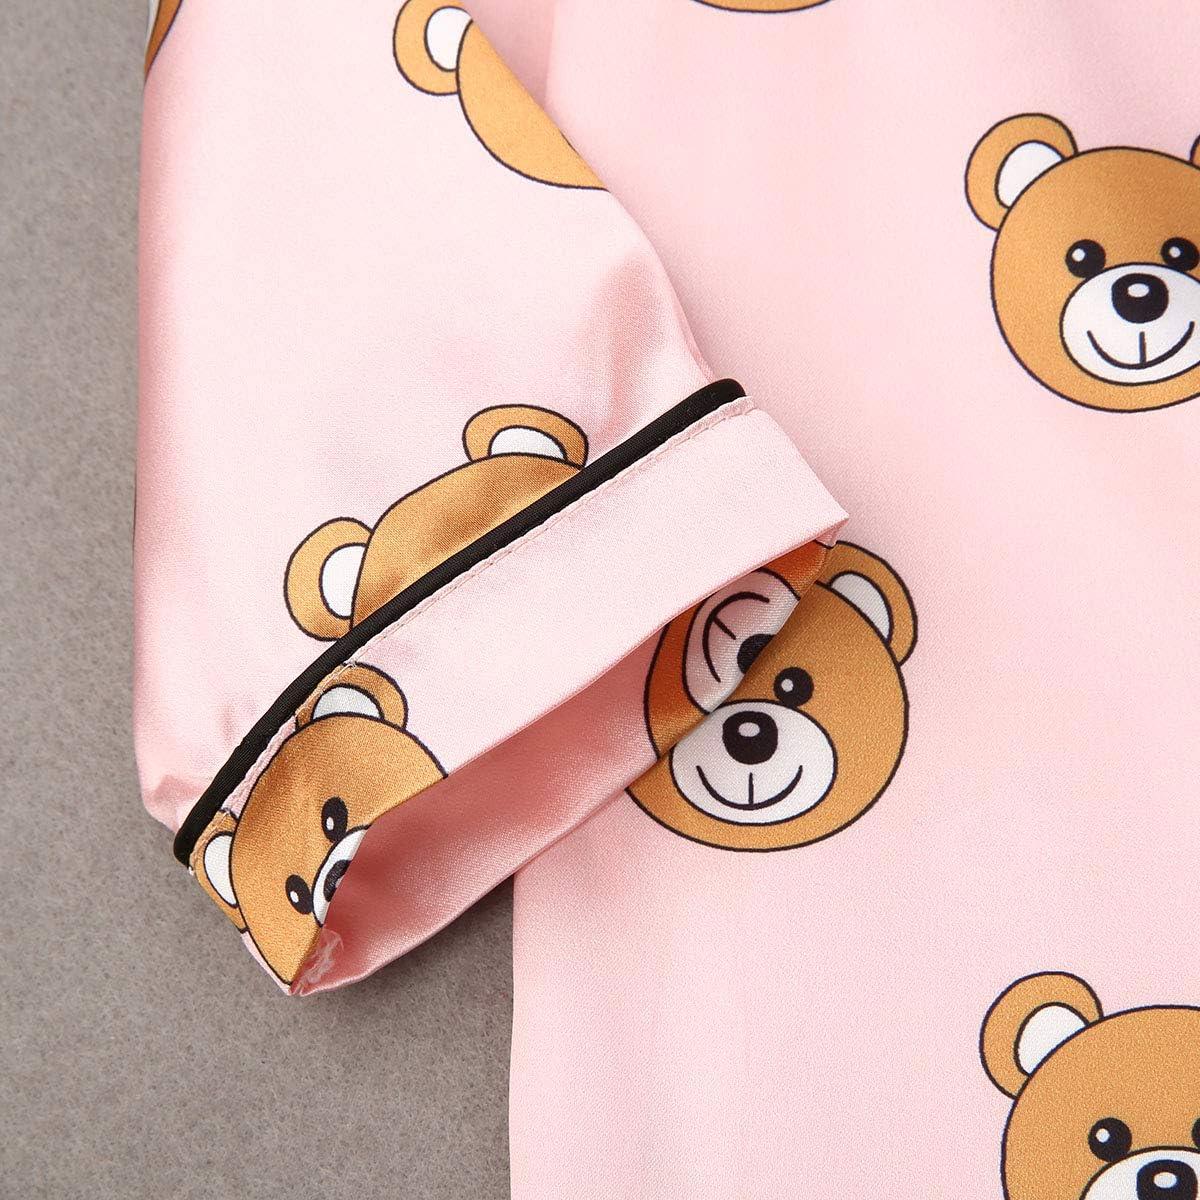 Baby Boy Girl Kids Silk Pajamas Set Long Sleeve Sleepwear Kids Nightwear Polka Dot Nightgown